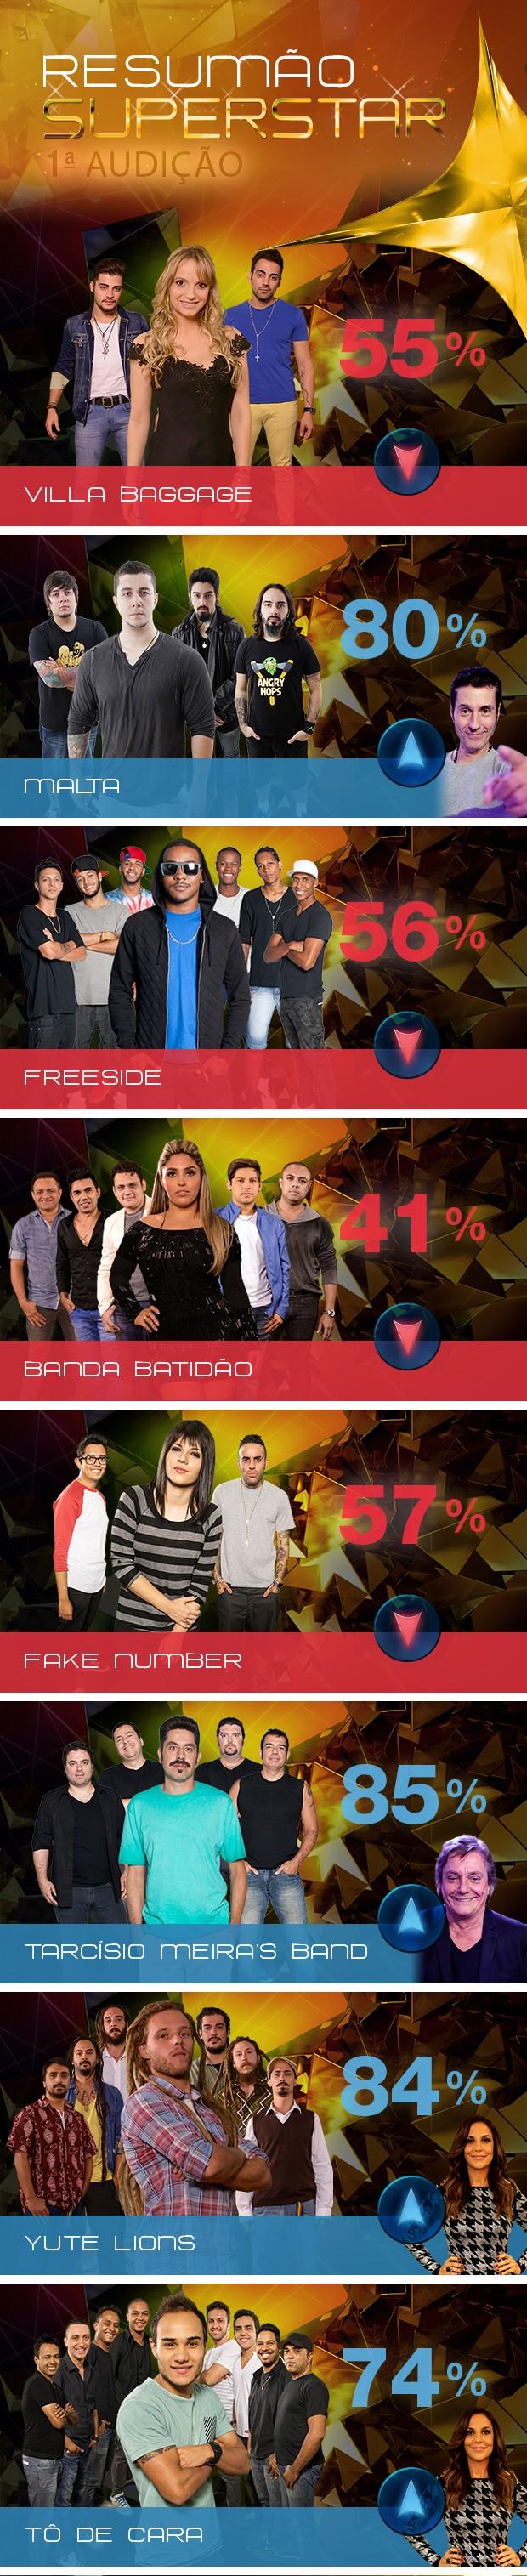 Arte Resumo SuperStar valendo (Foto: TV Globo/SuperStar)